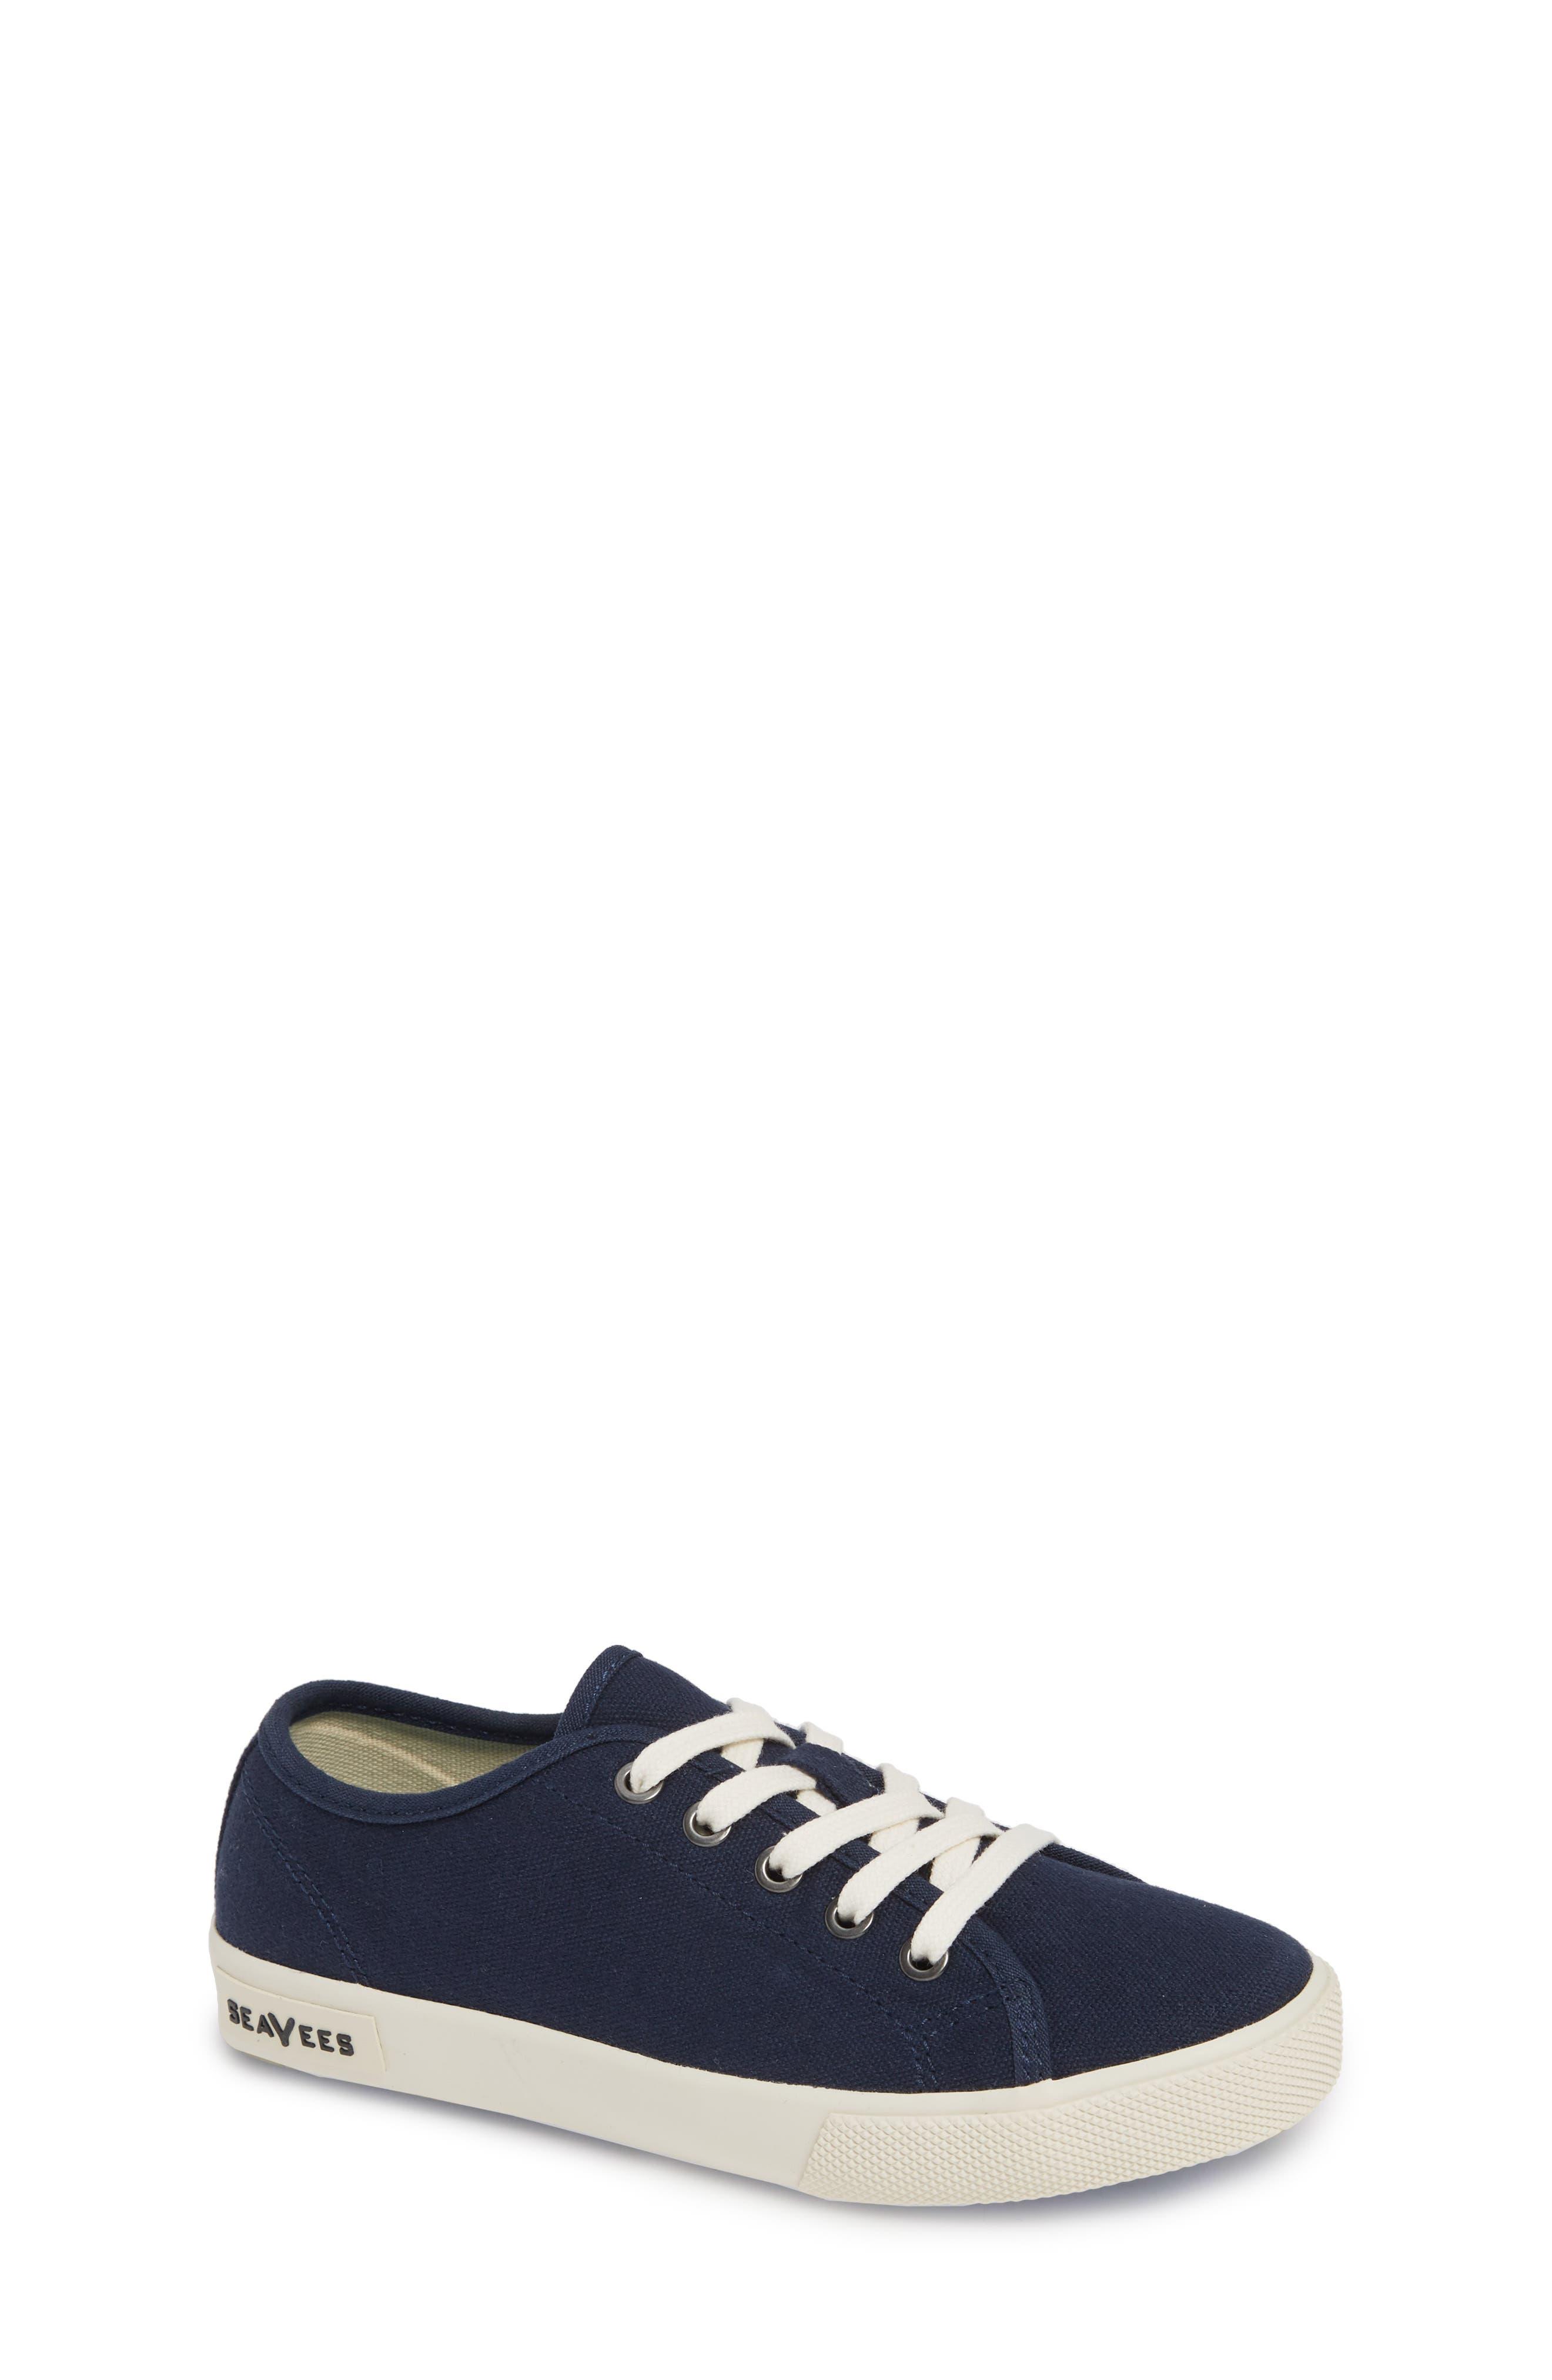 Kids Seavees Monterey Standard Sneaker Size 4 M  Blue